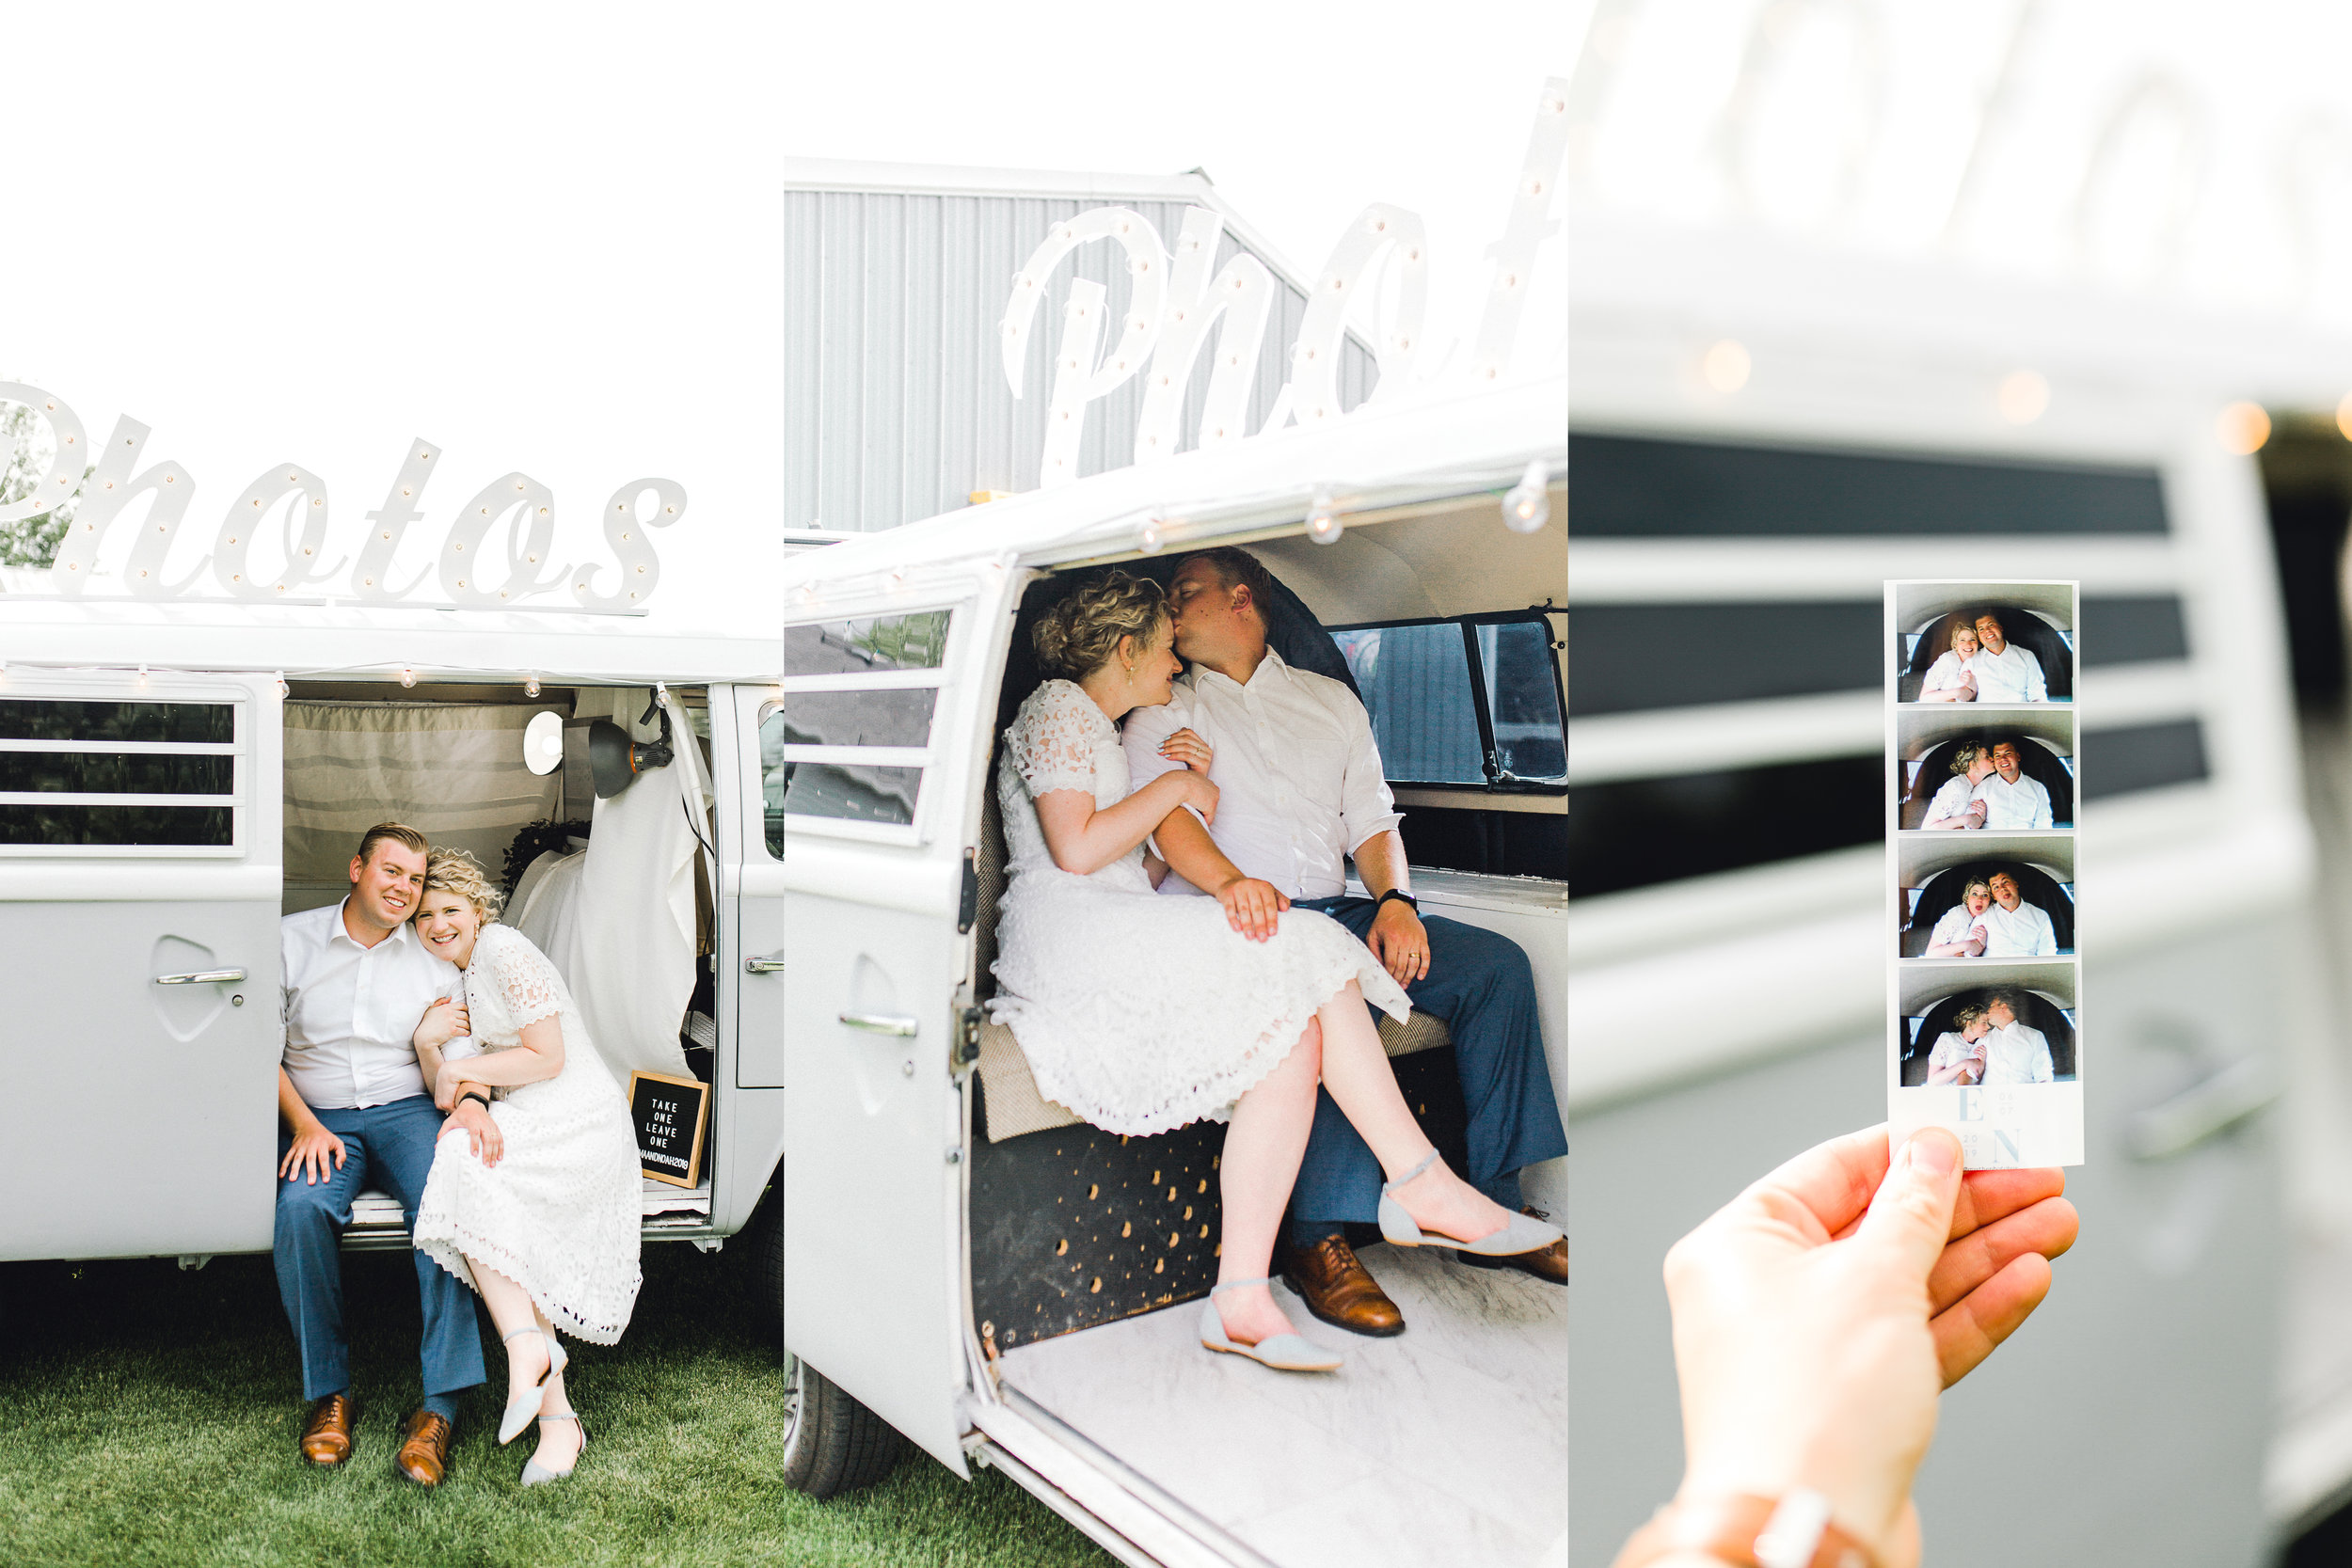 beautiful-outdoor-backyard-wedding-reception-anna-christine-photography-rexburg-idaho-2.jpg